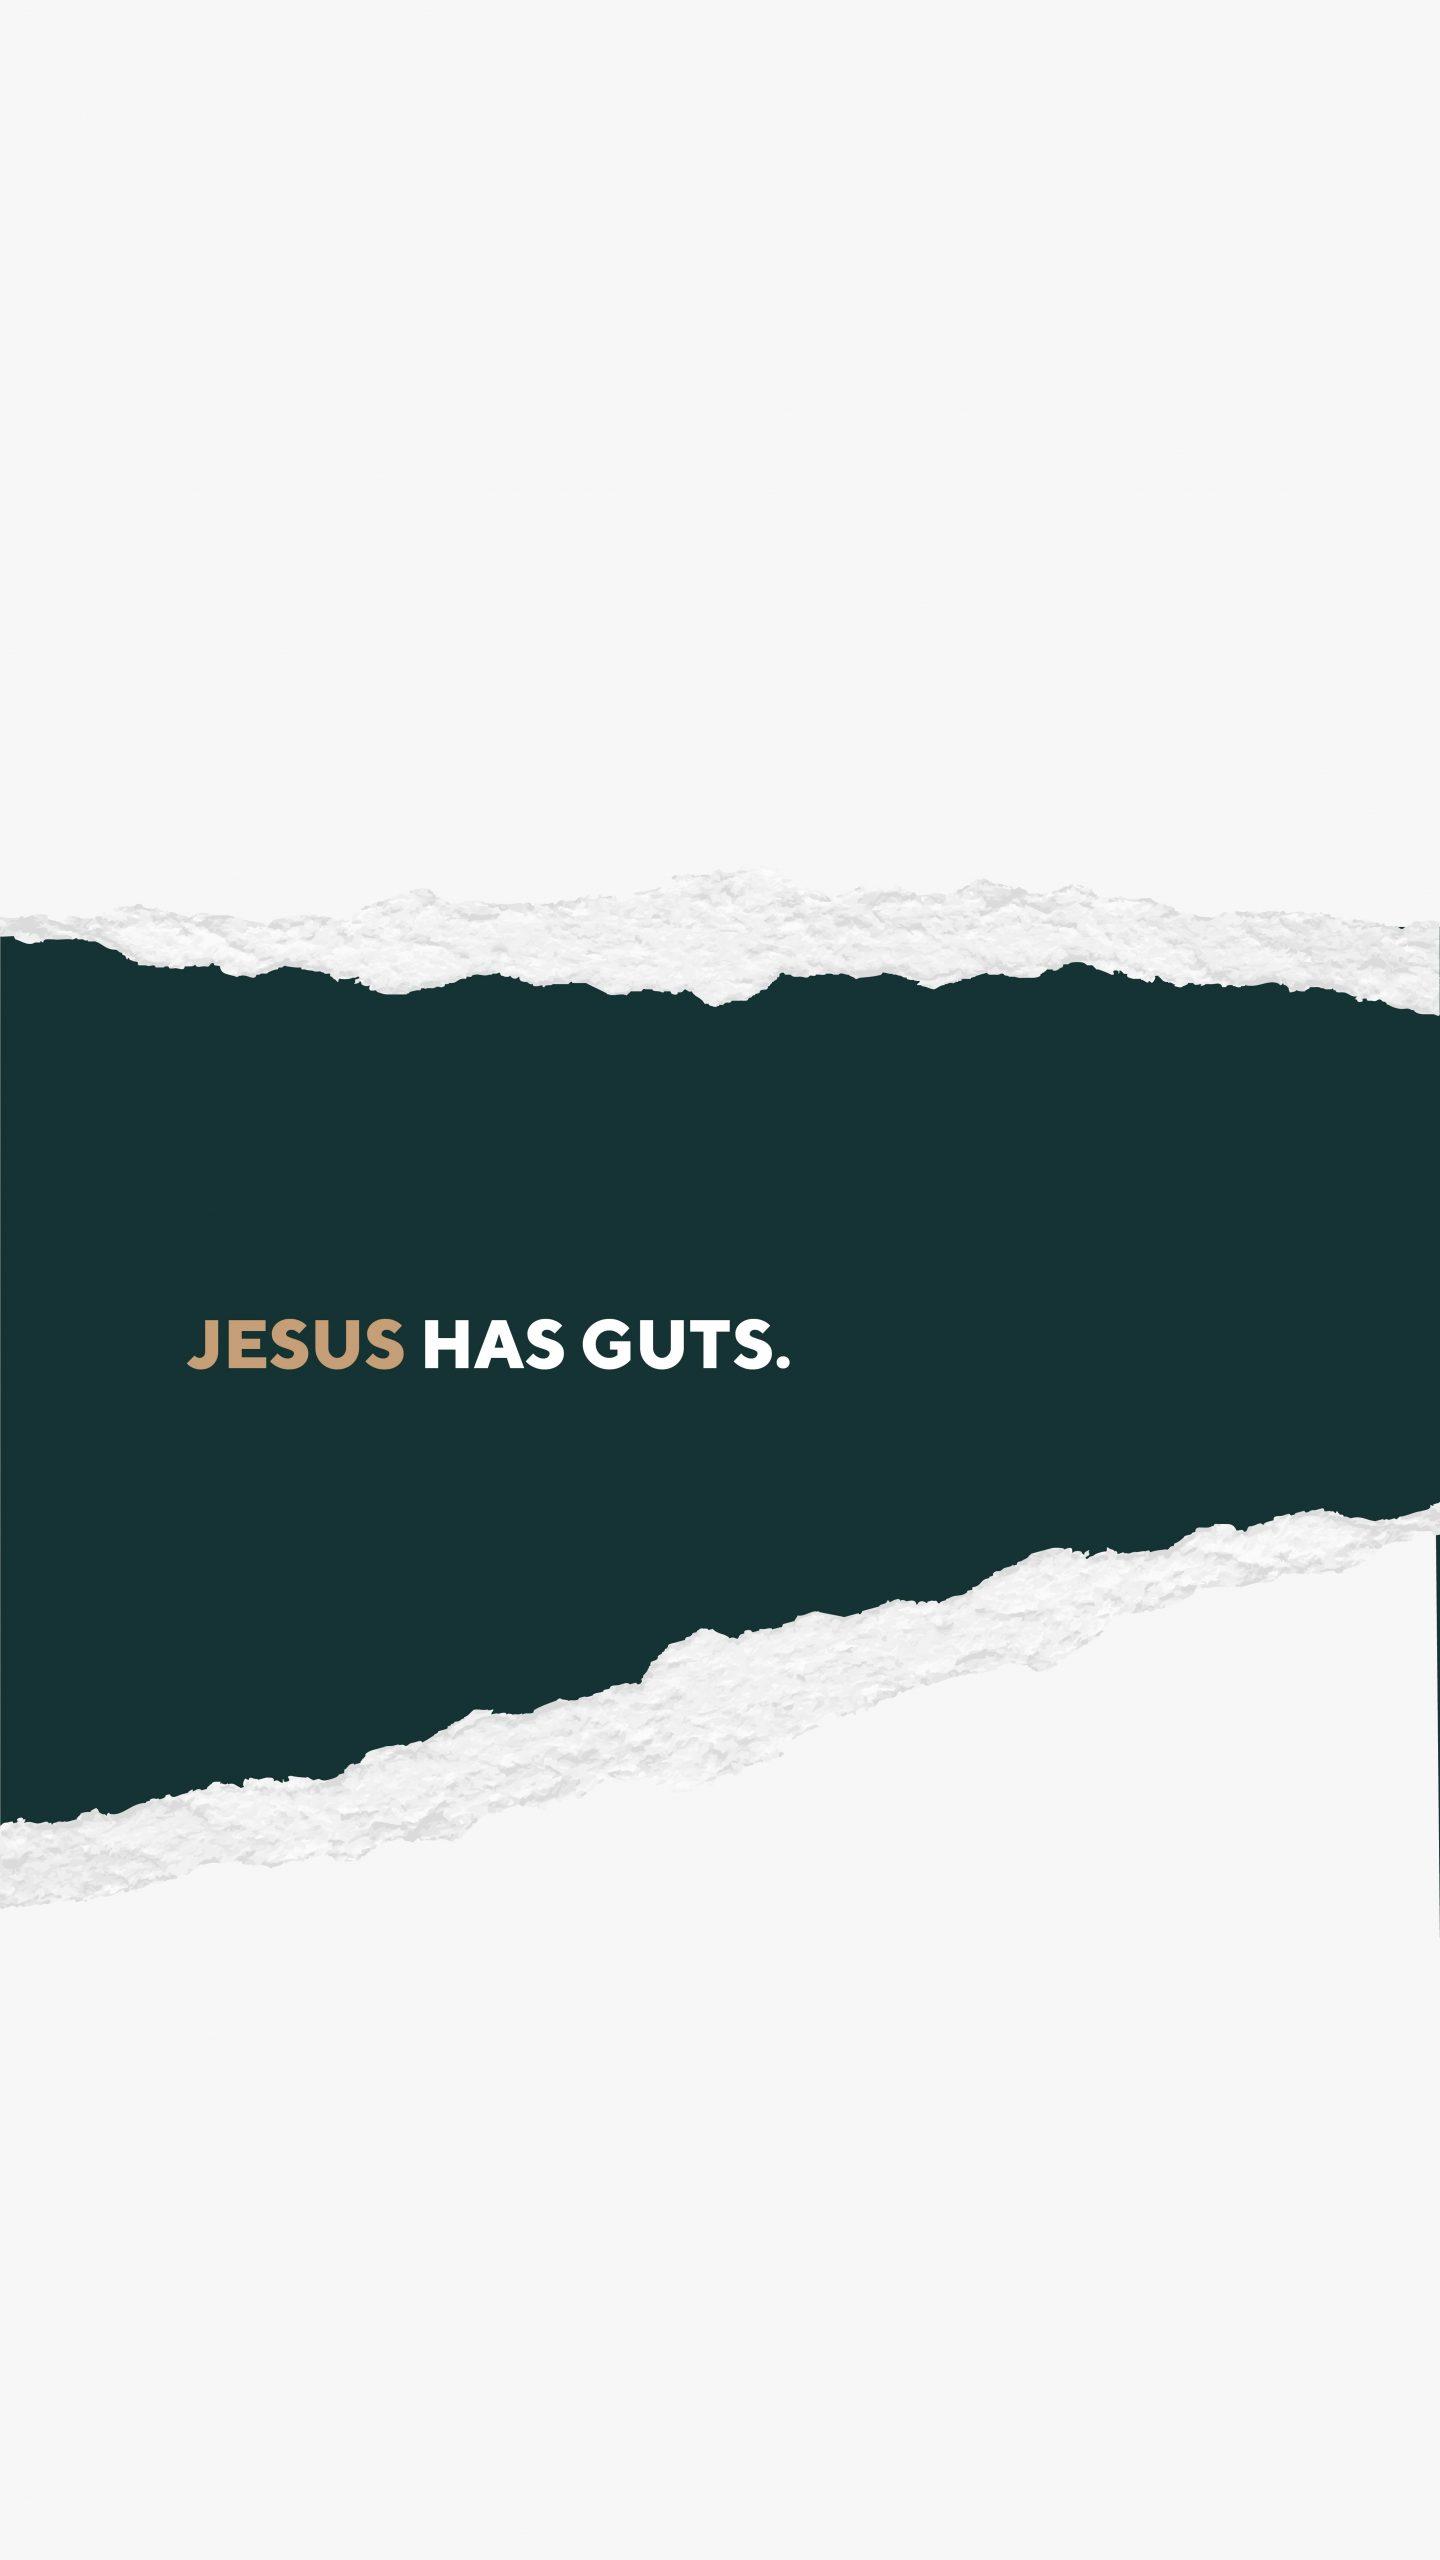 light-city-Jesus Has guts-background